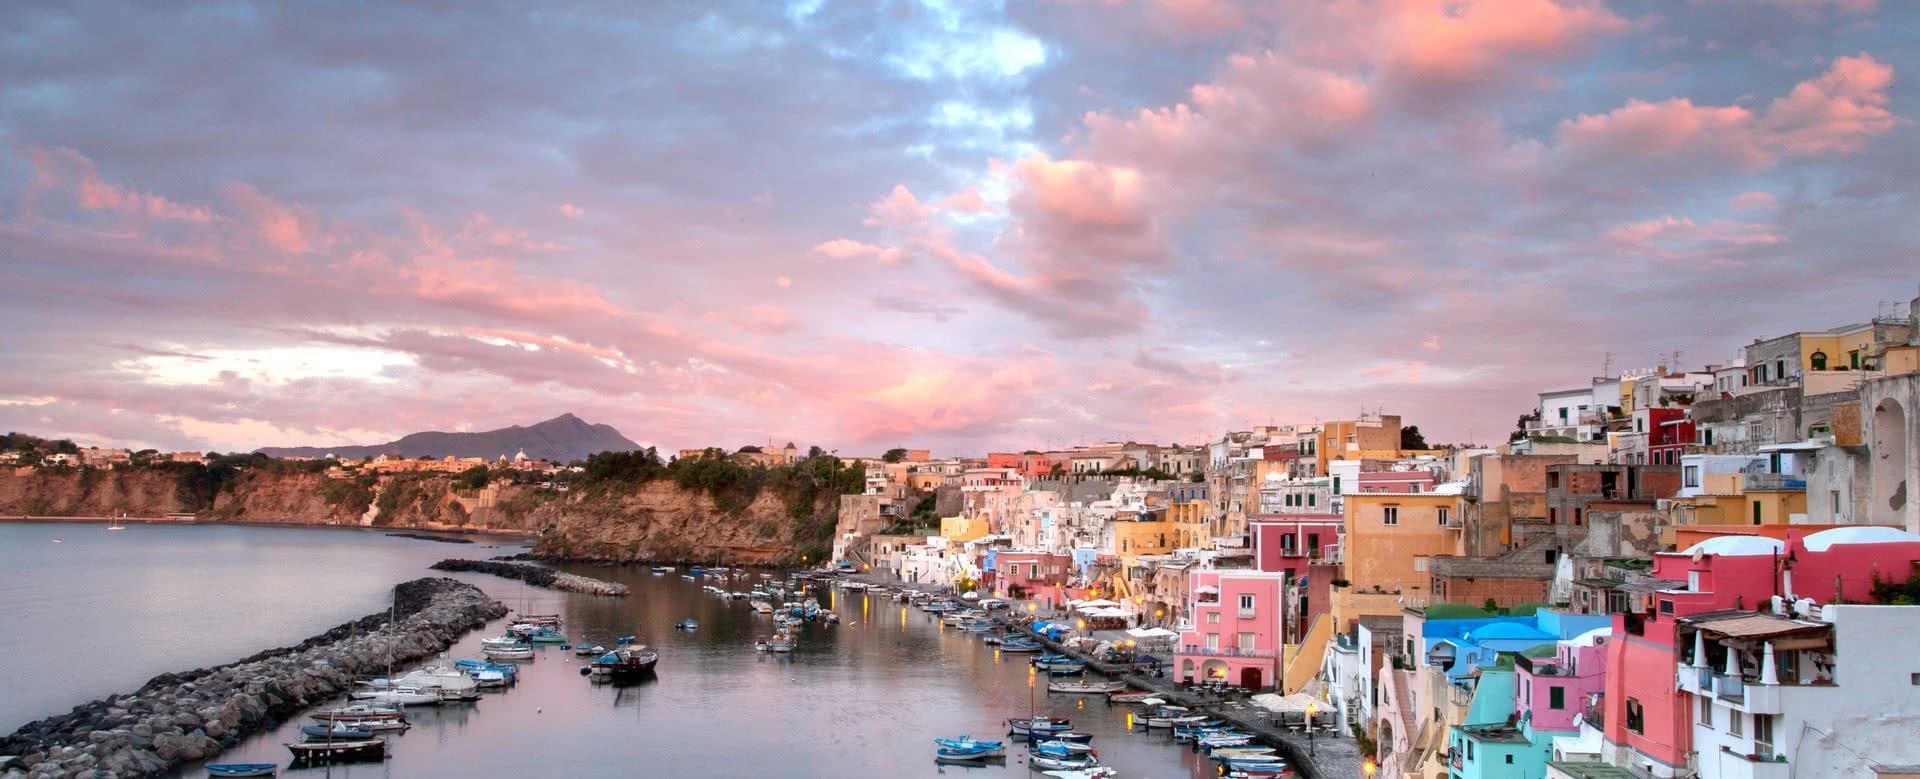 Titelbild von Neapel